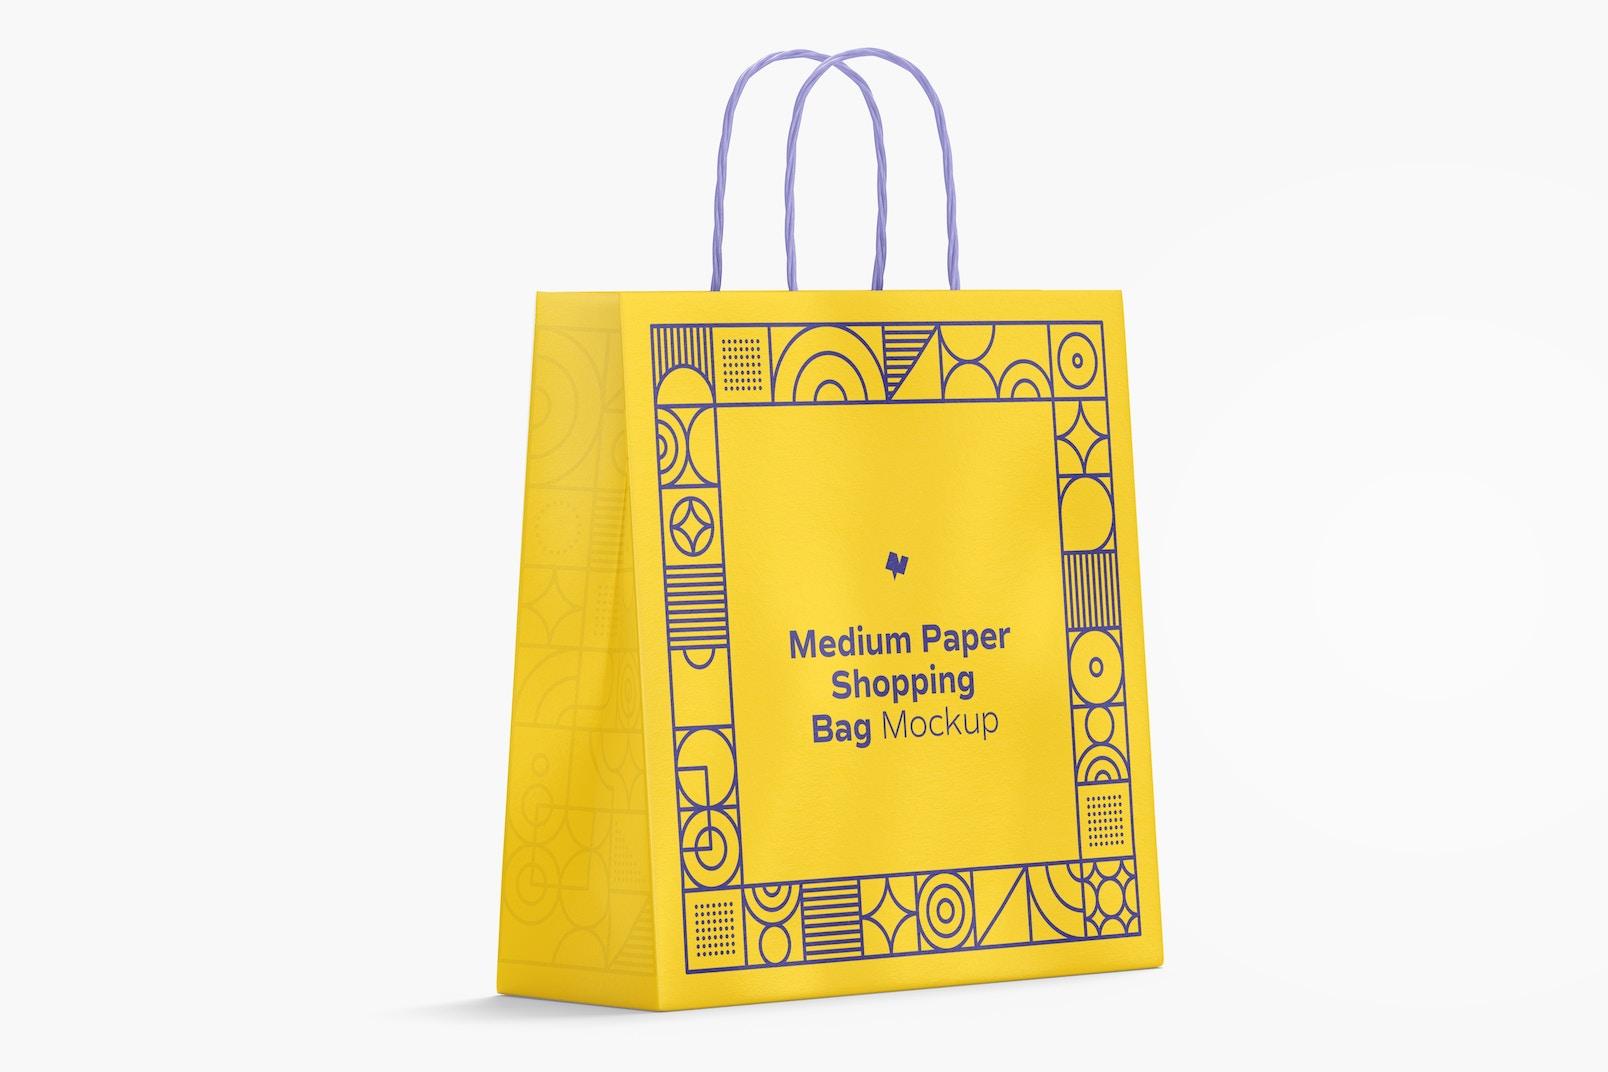 Medium Paper Shopping Bag Mockup, Left View